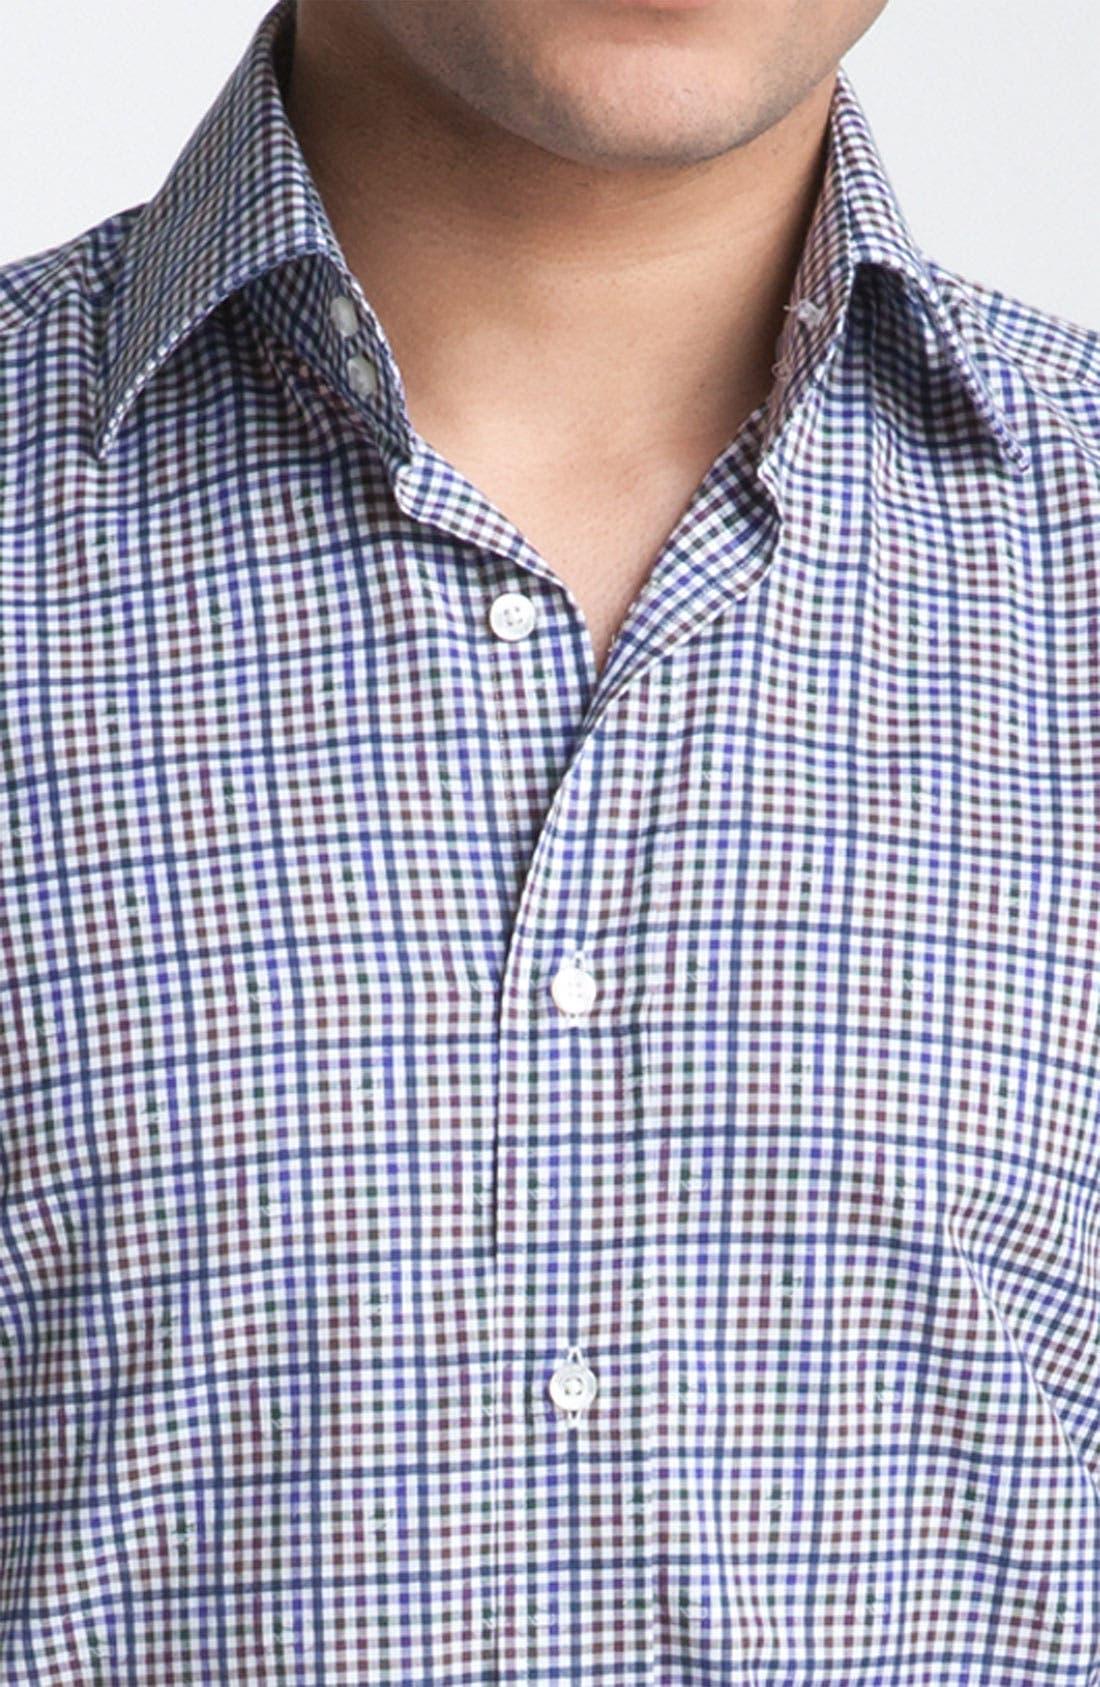 Alternate Image 3  - Etro Plaid Woven Dress Shirt